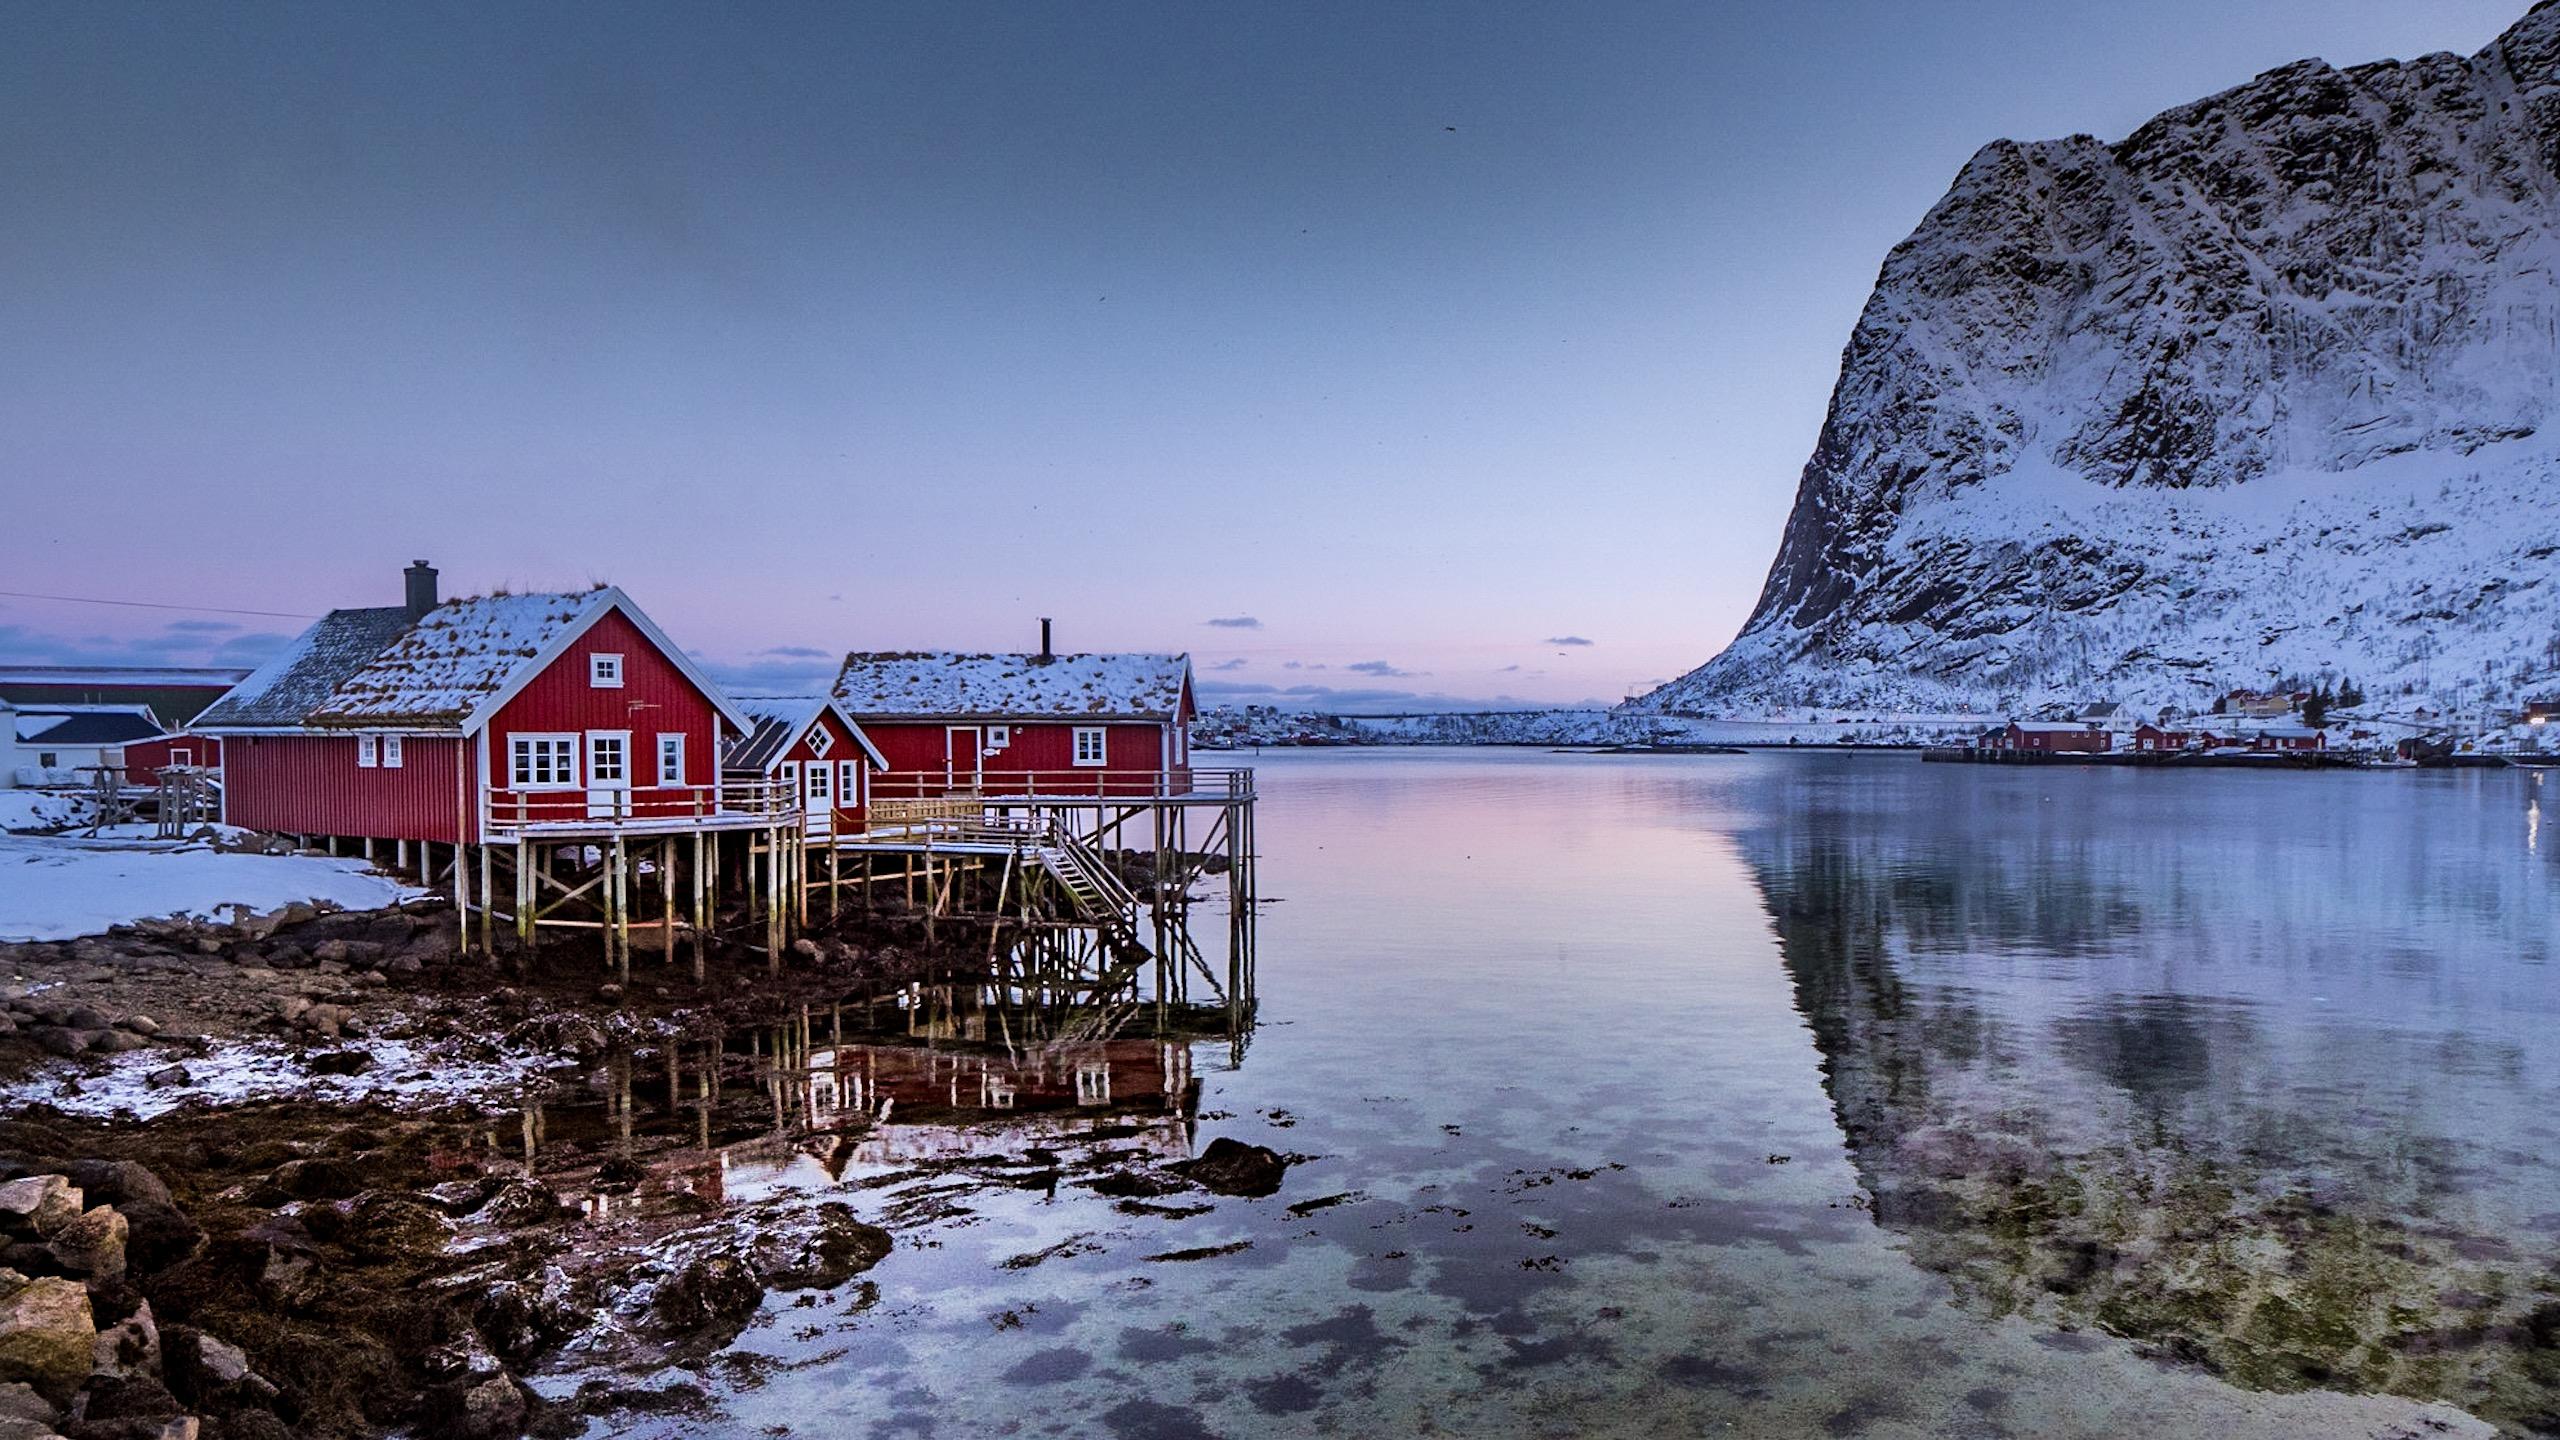 Sunset on a Lofoten fjord